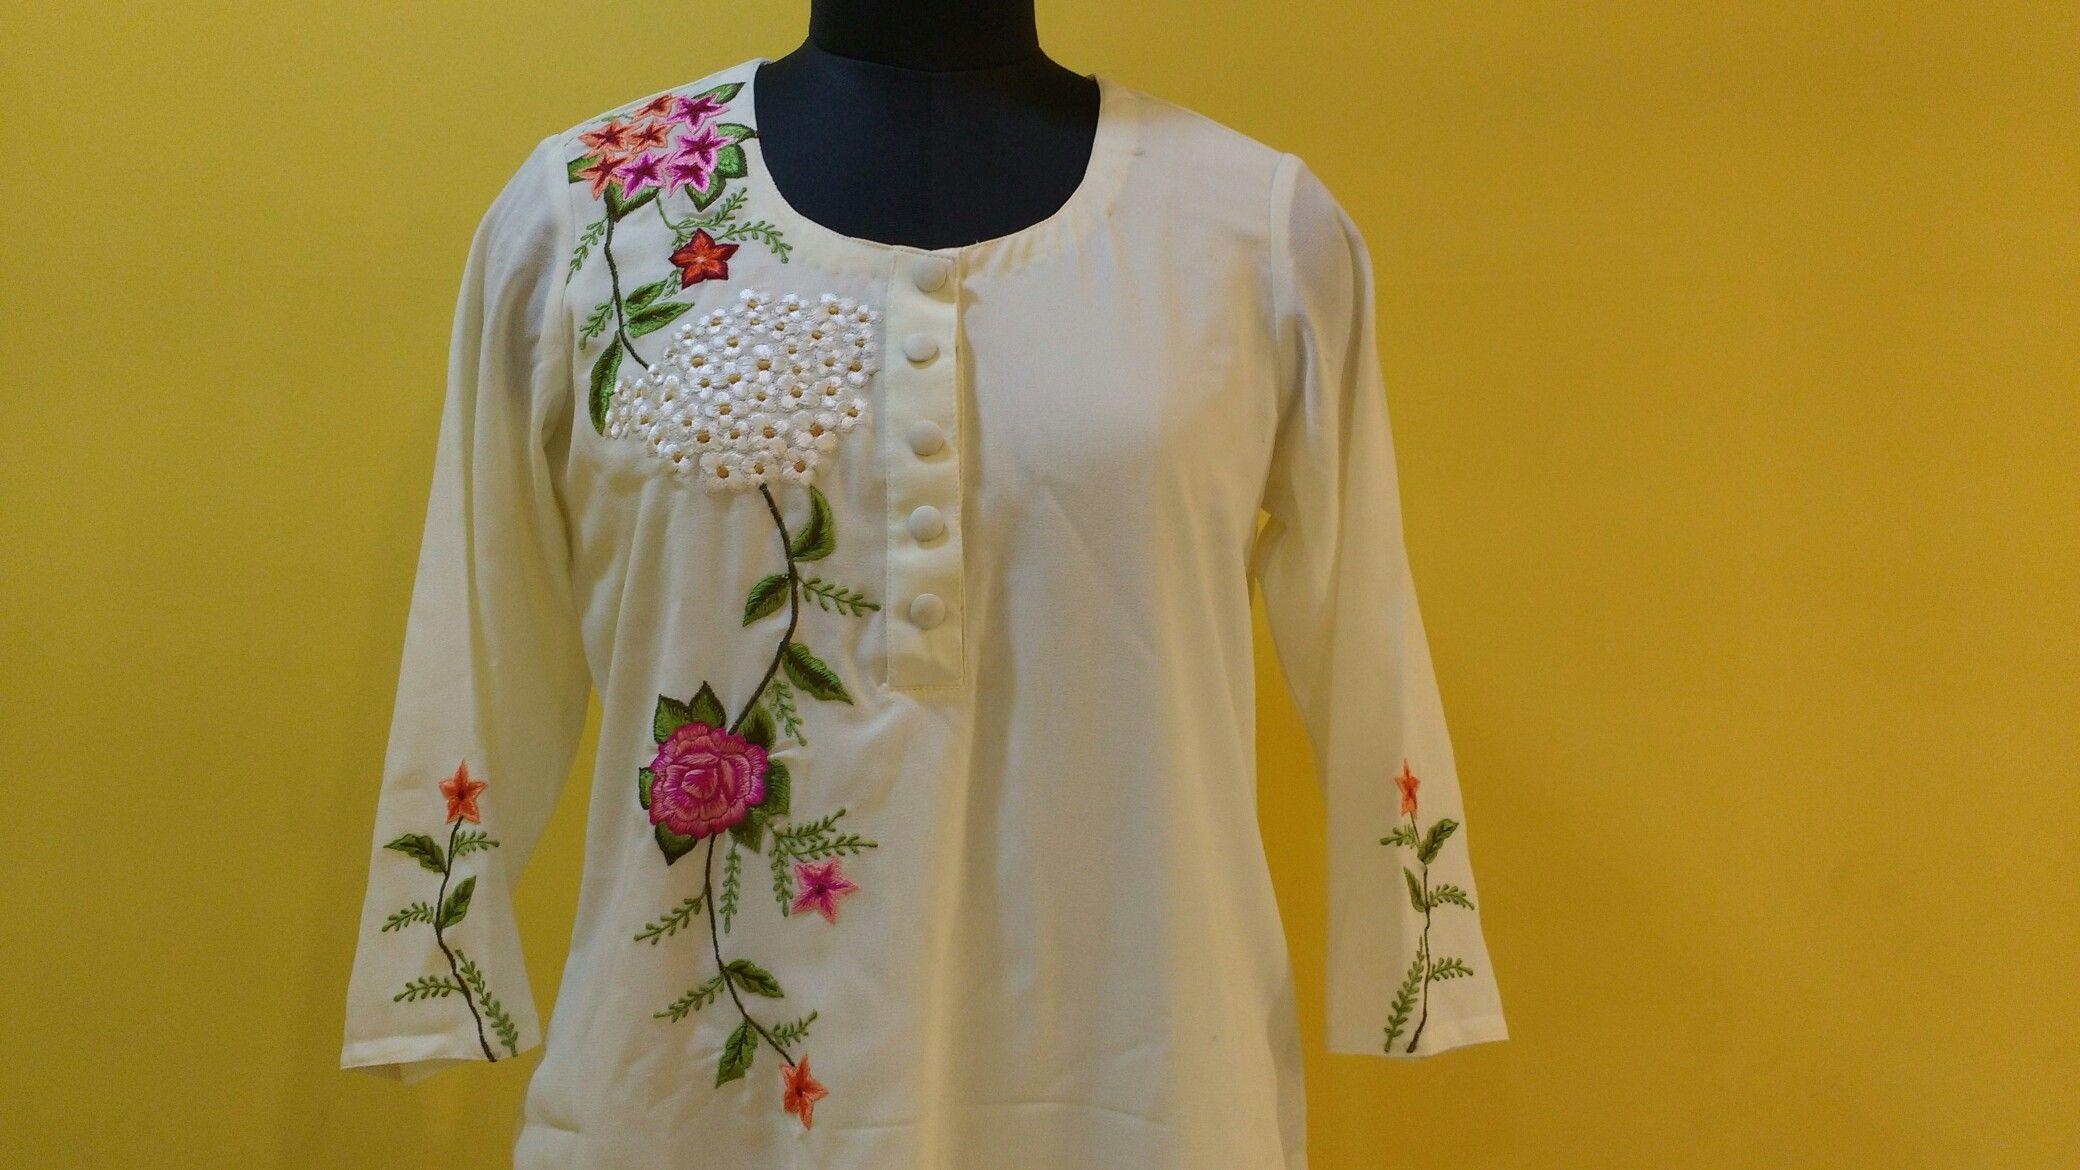 Embroidery - Elegant & Simple